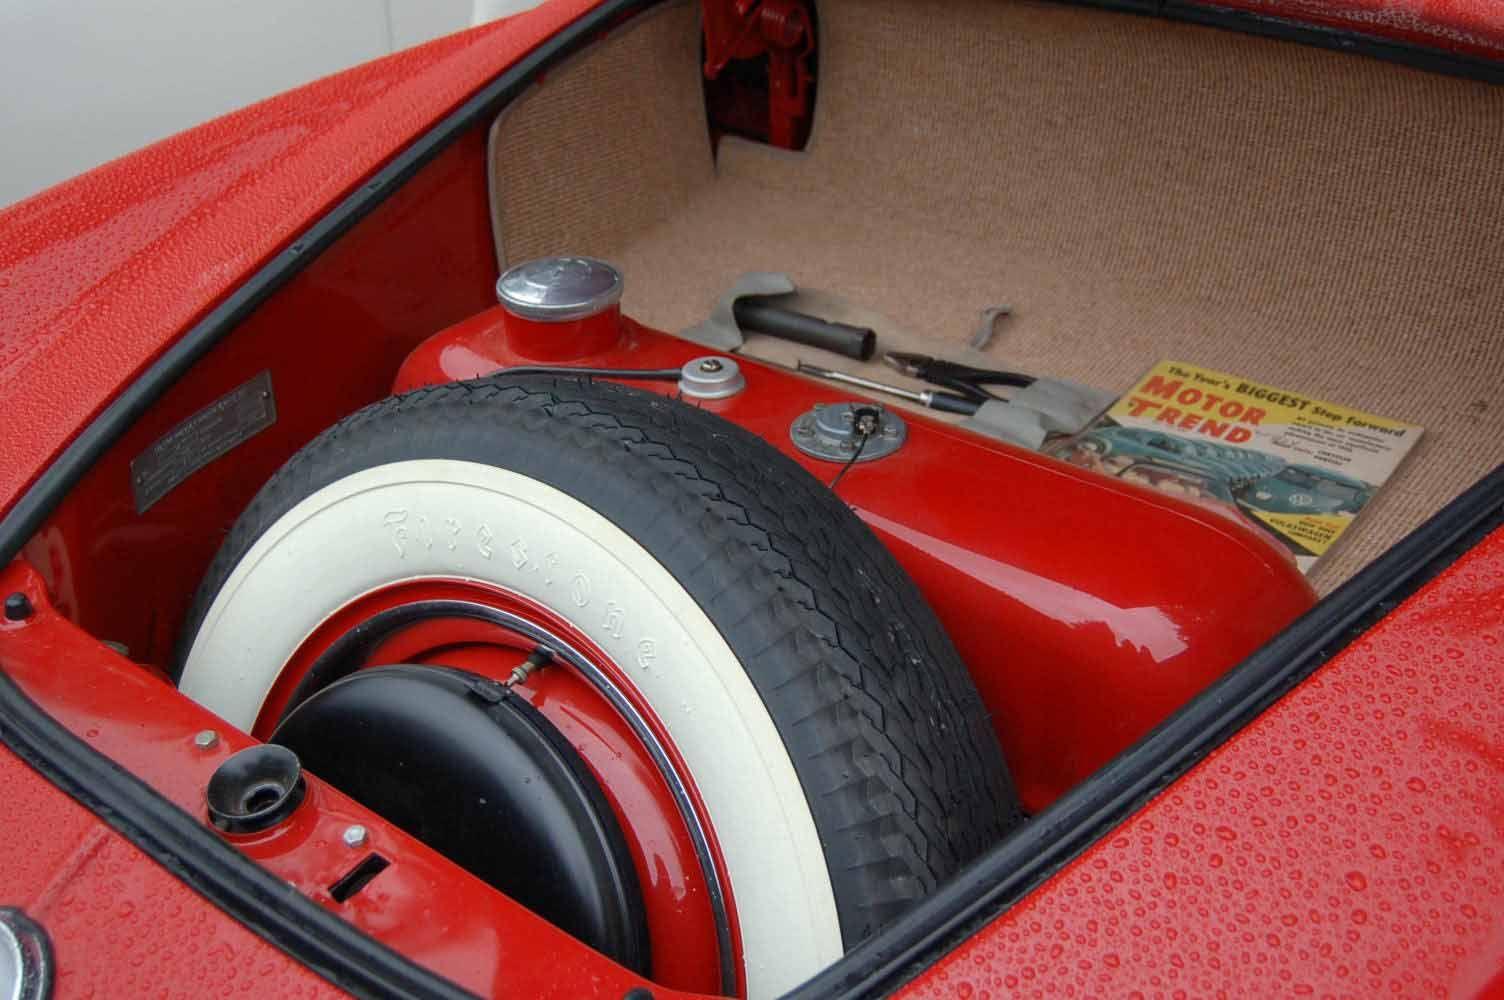 Restored Trunk Area In 1959 Volkswagen Karmann Ghia Coupe Vw Karmann Ghia Karmann Ghia Volkswagen Karmann Ghia